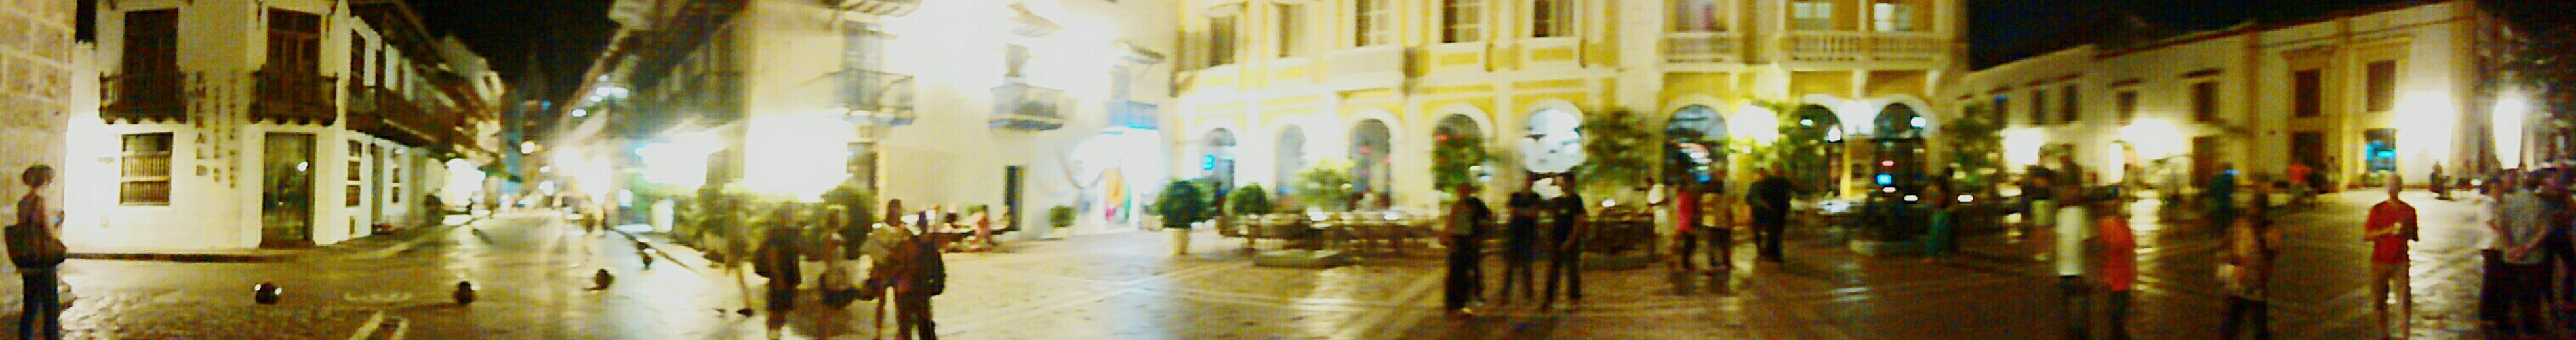 Mi fantástica! Nightphotography City Night Lights EyeEm Best Shots Enjoying Life Architecture_collection I Love Colombia Cartagena, Colombia Colombia ♥  La Fantastica